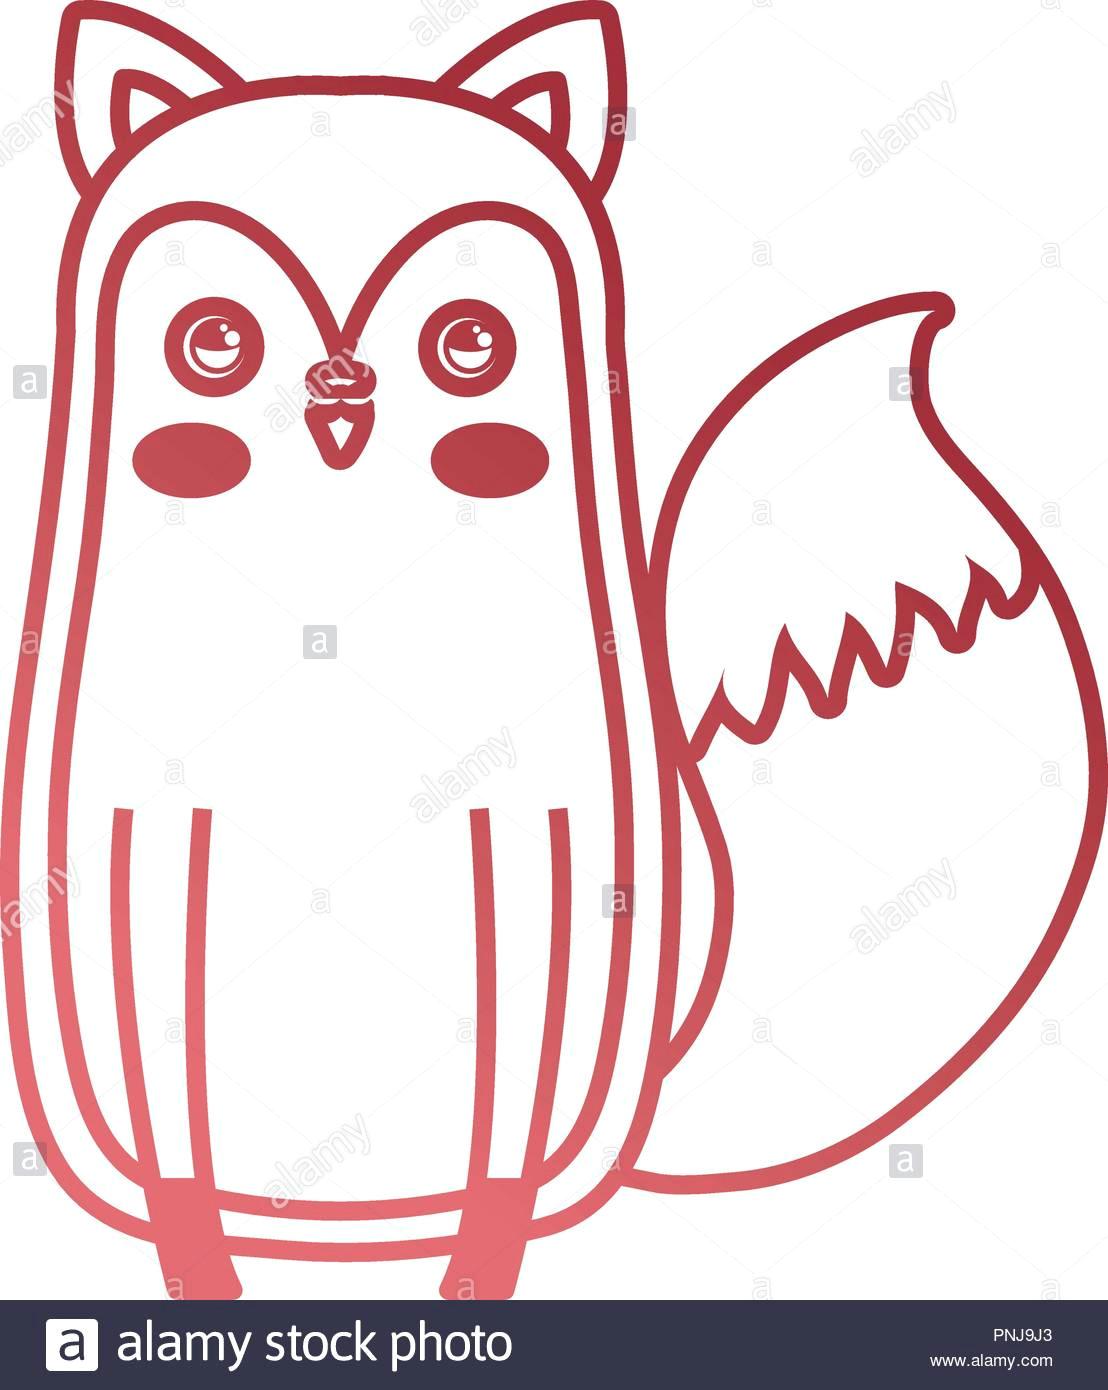 cute fox sitting animal baby drawing vector illustration neon pnj9j3 jpg